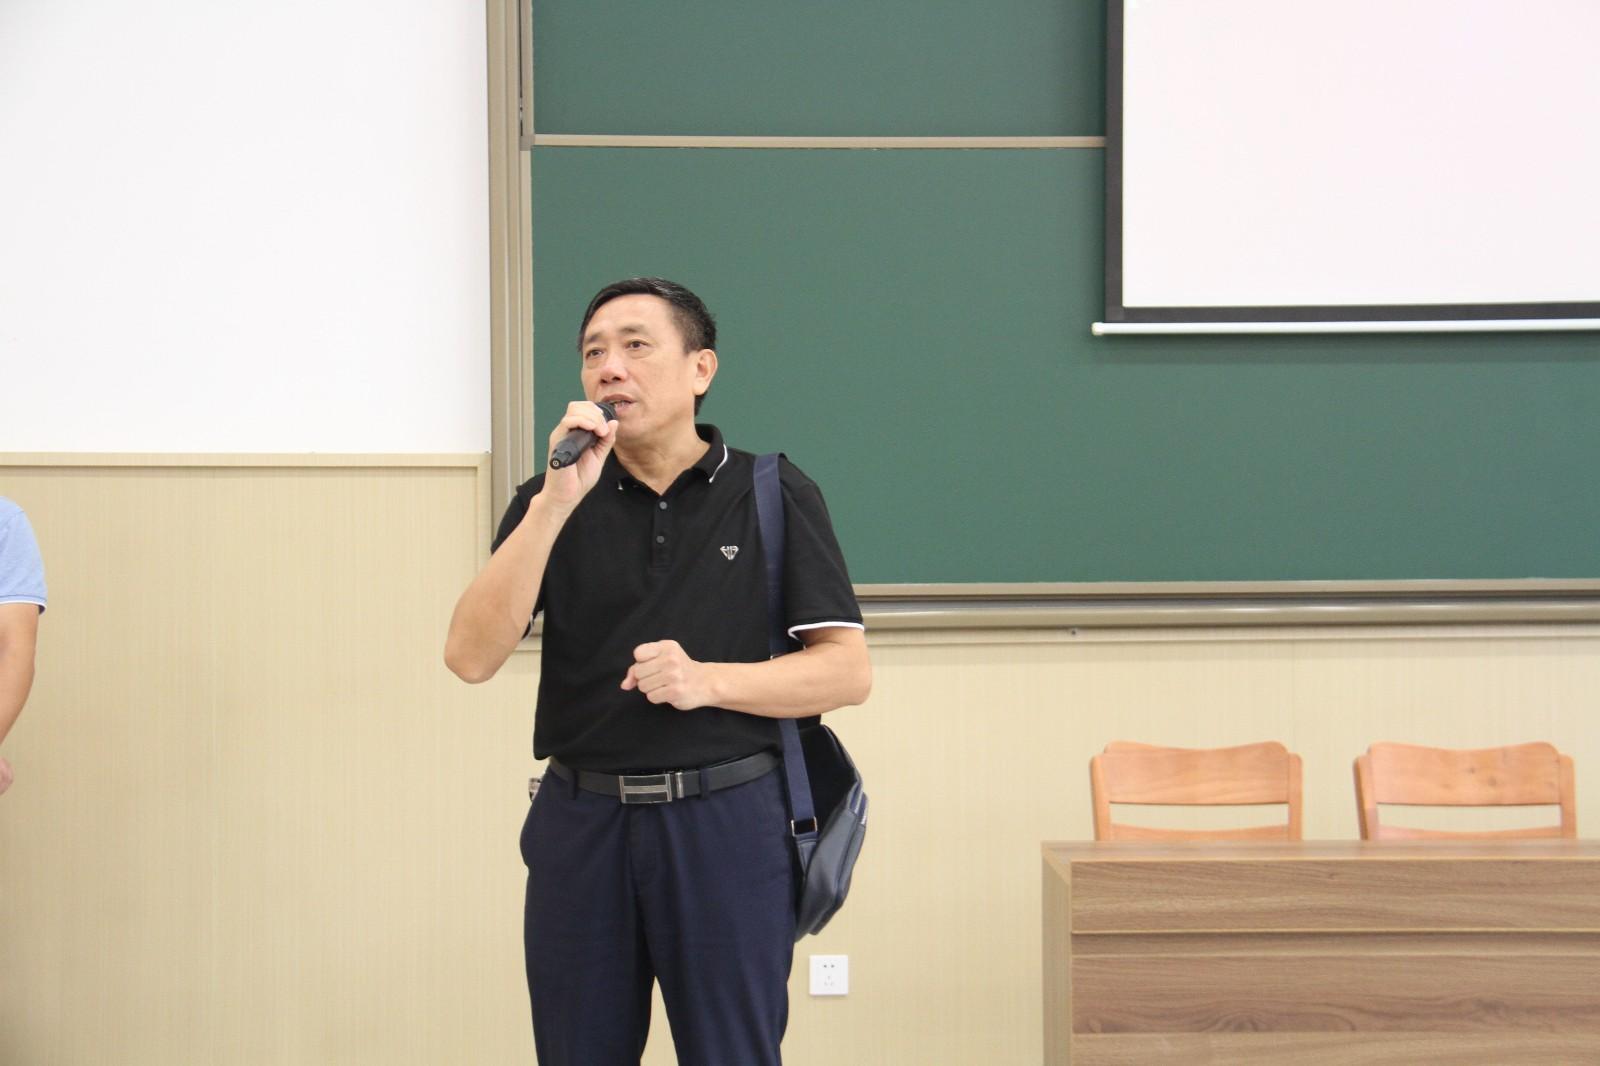 IMG_4543_看图王_看图王.jpg